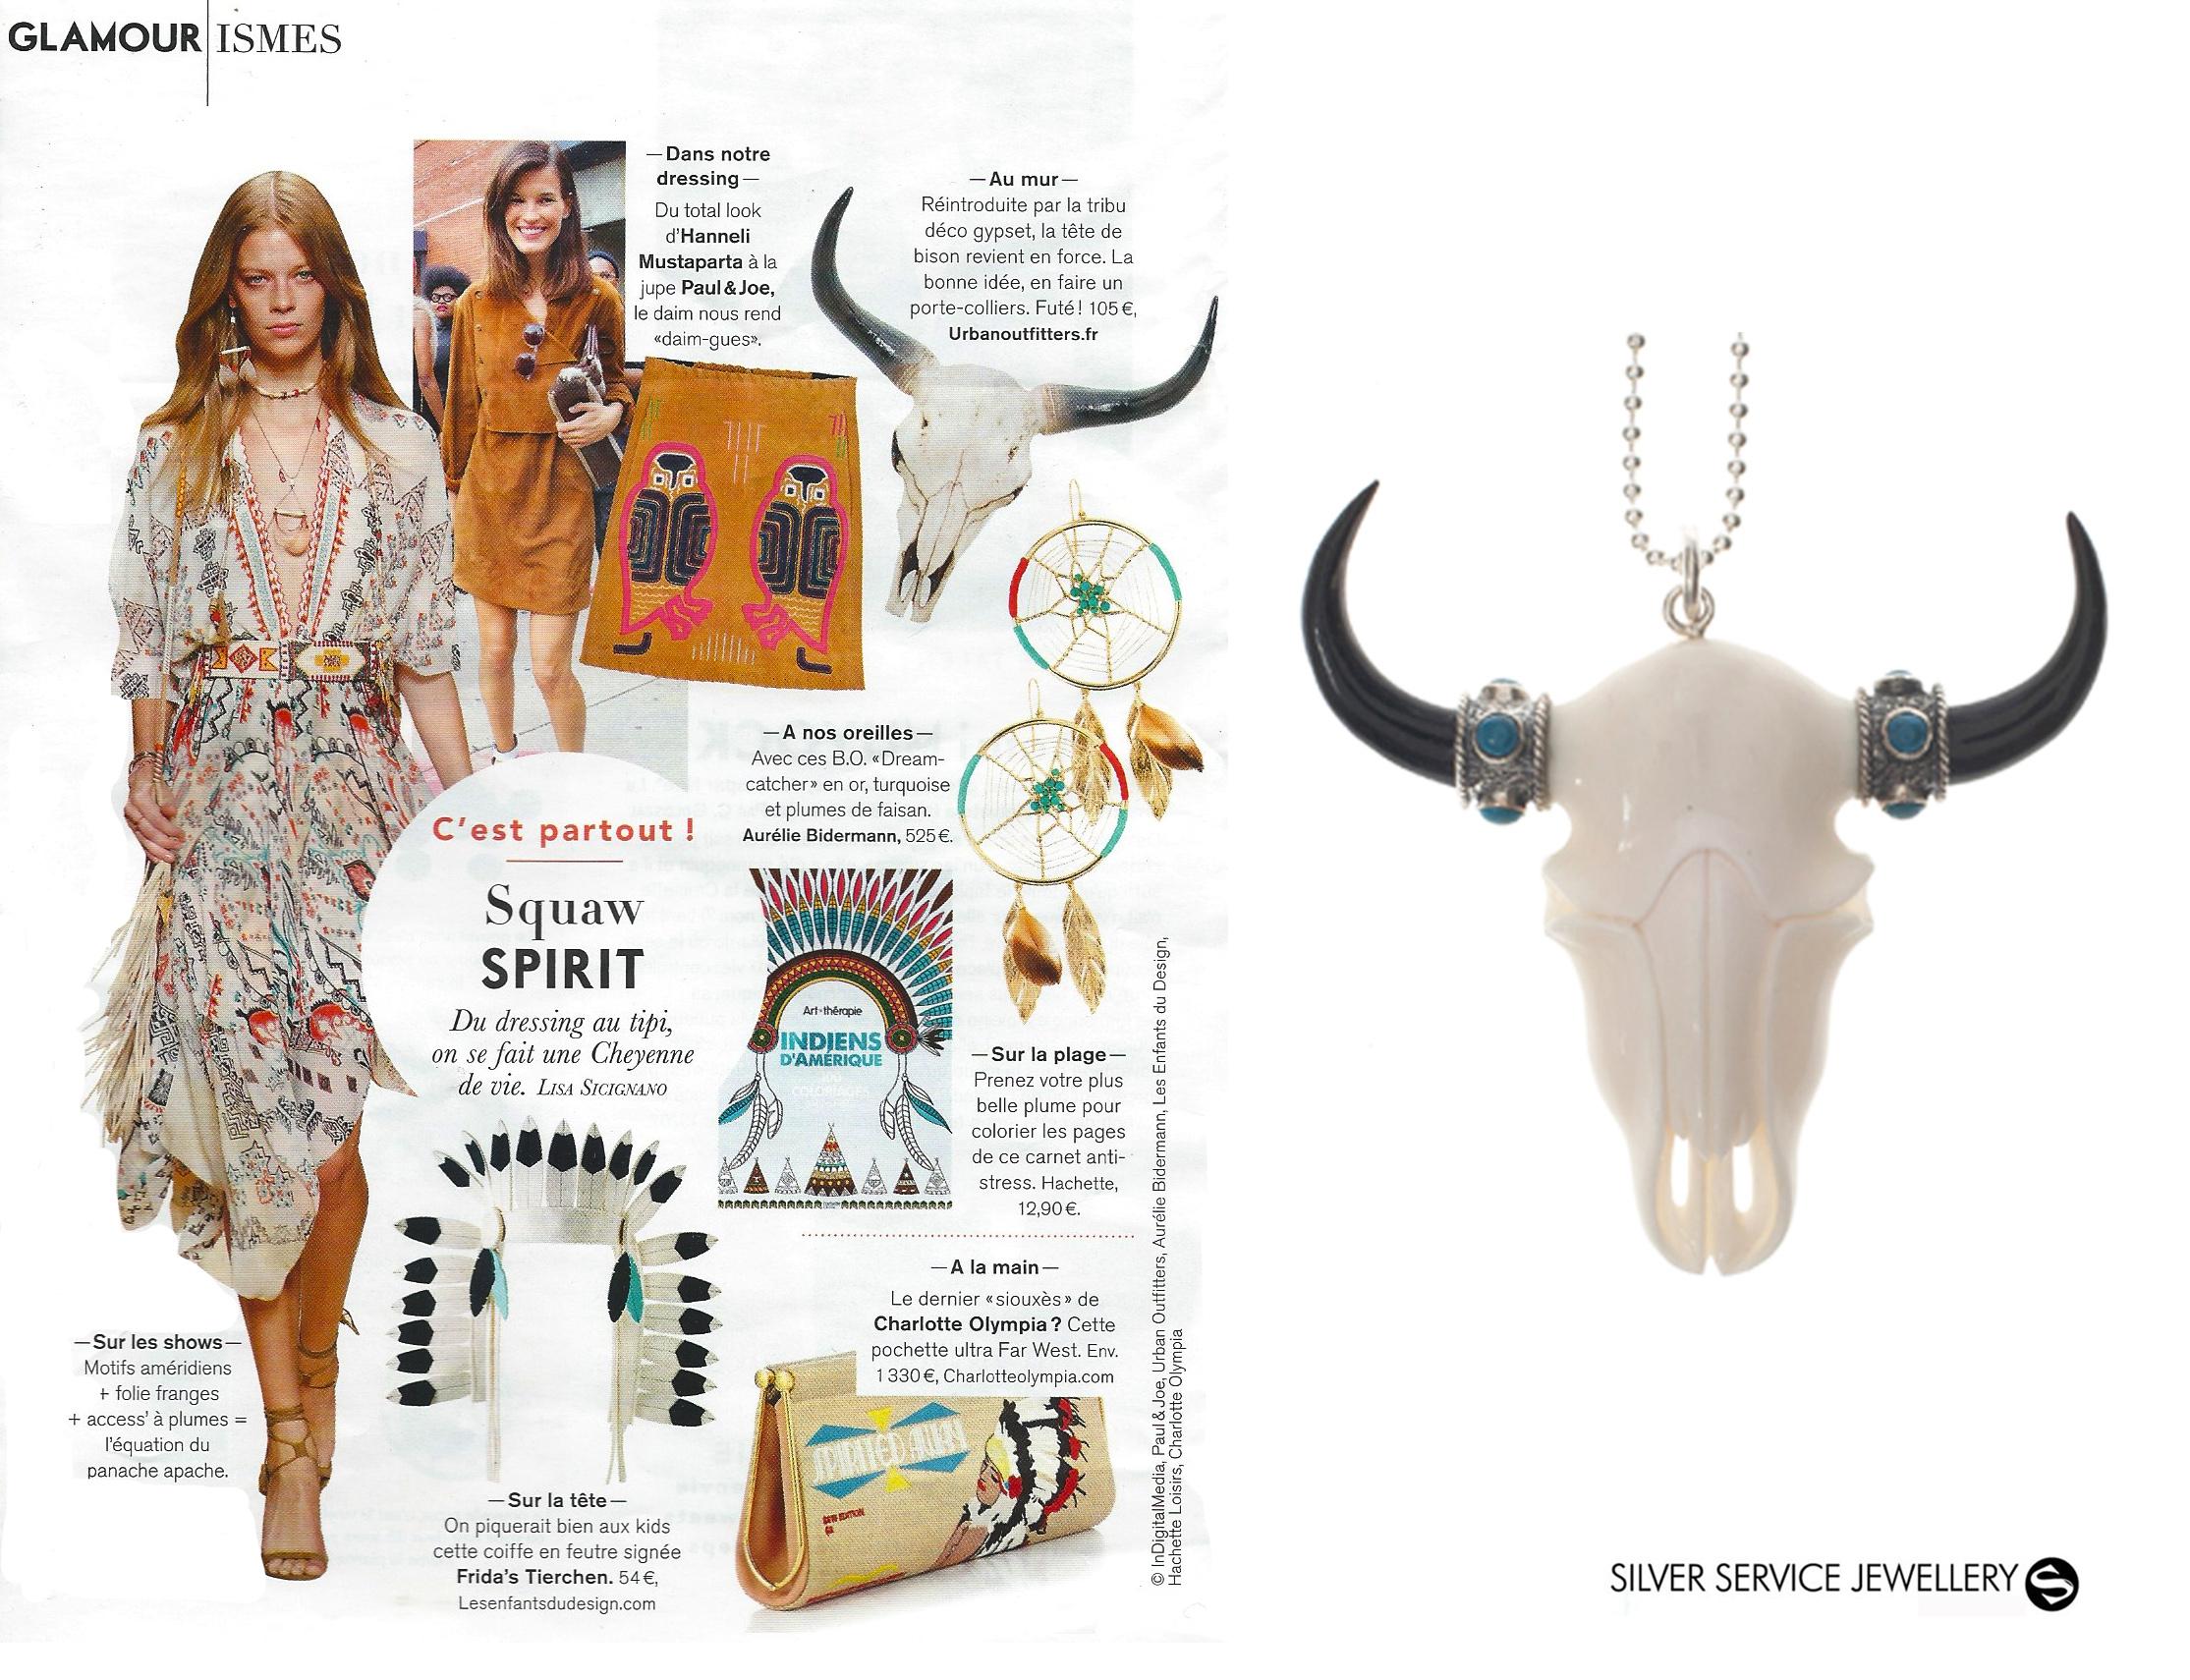 Glamour Magazine - Squaw Spirit